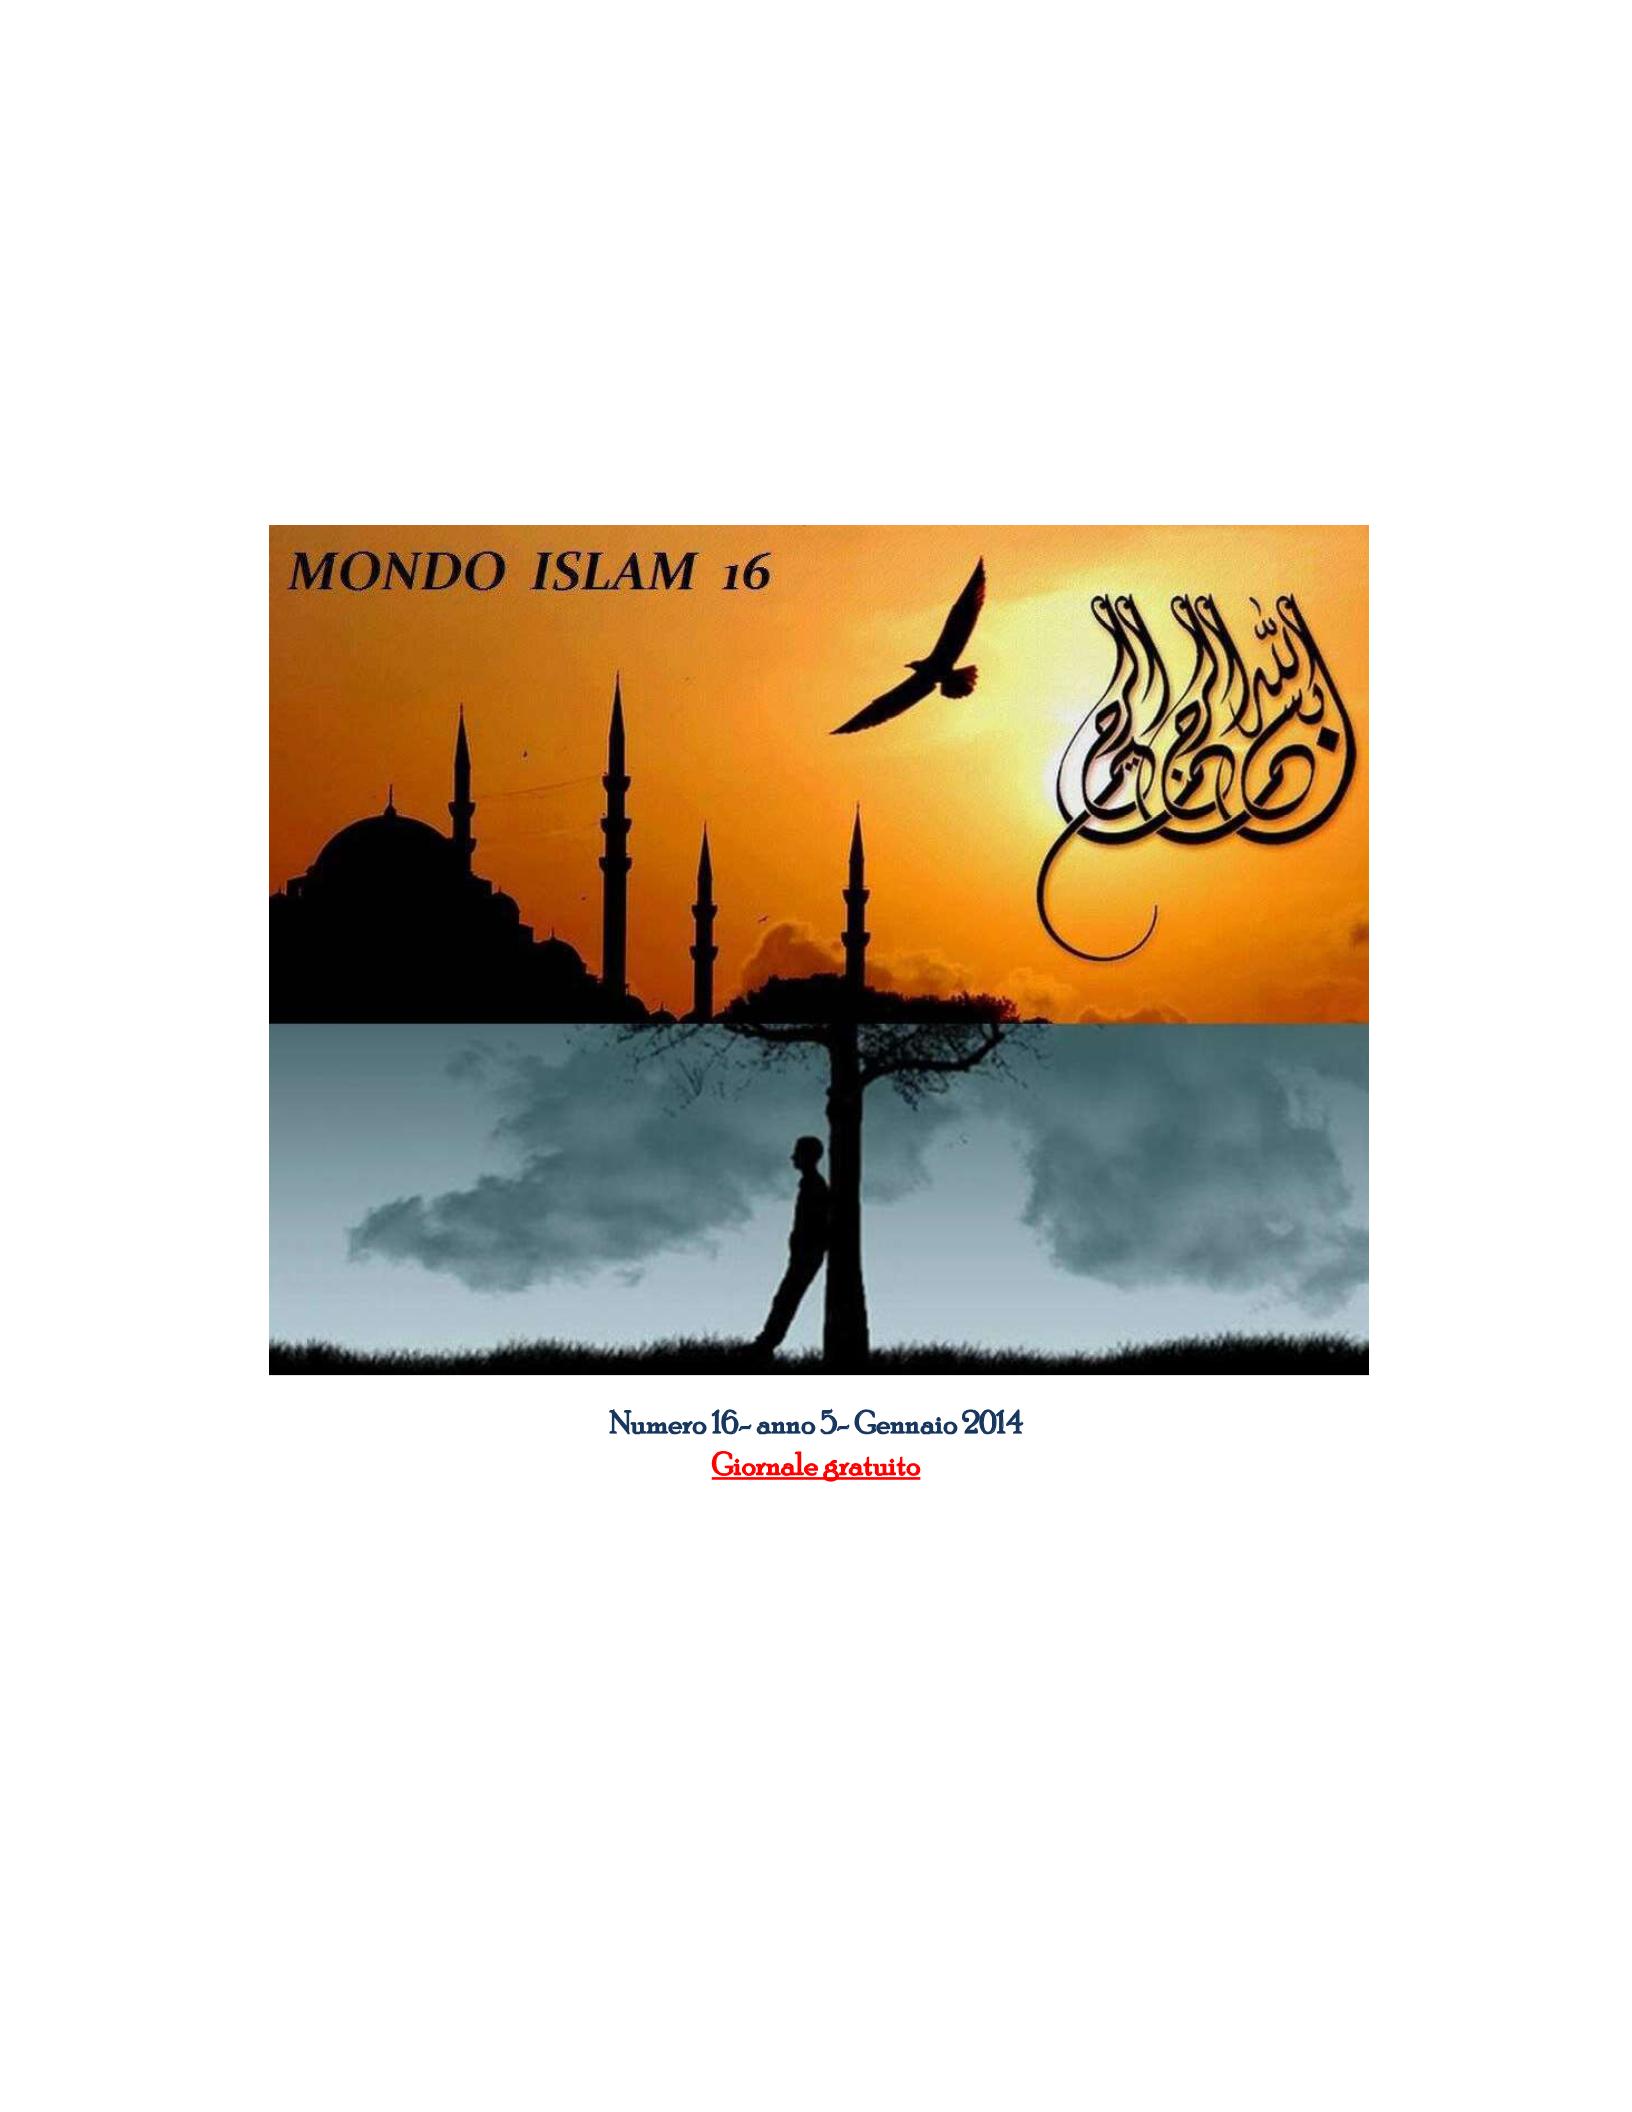 Mondo Islam 16